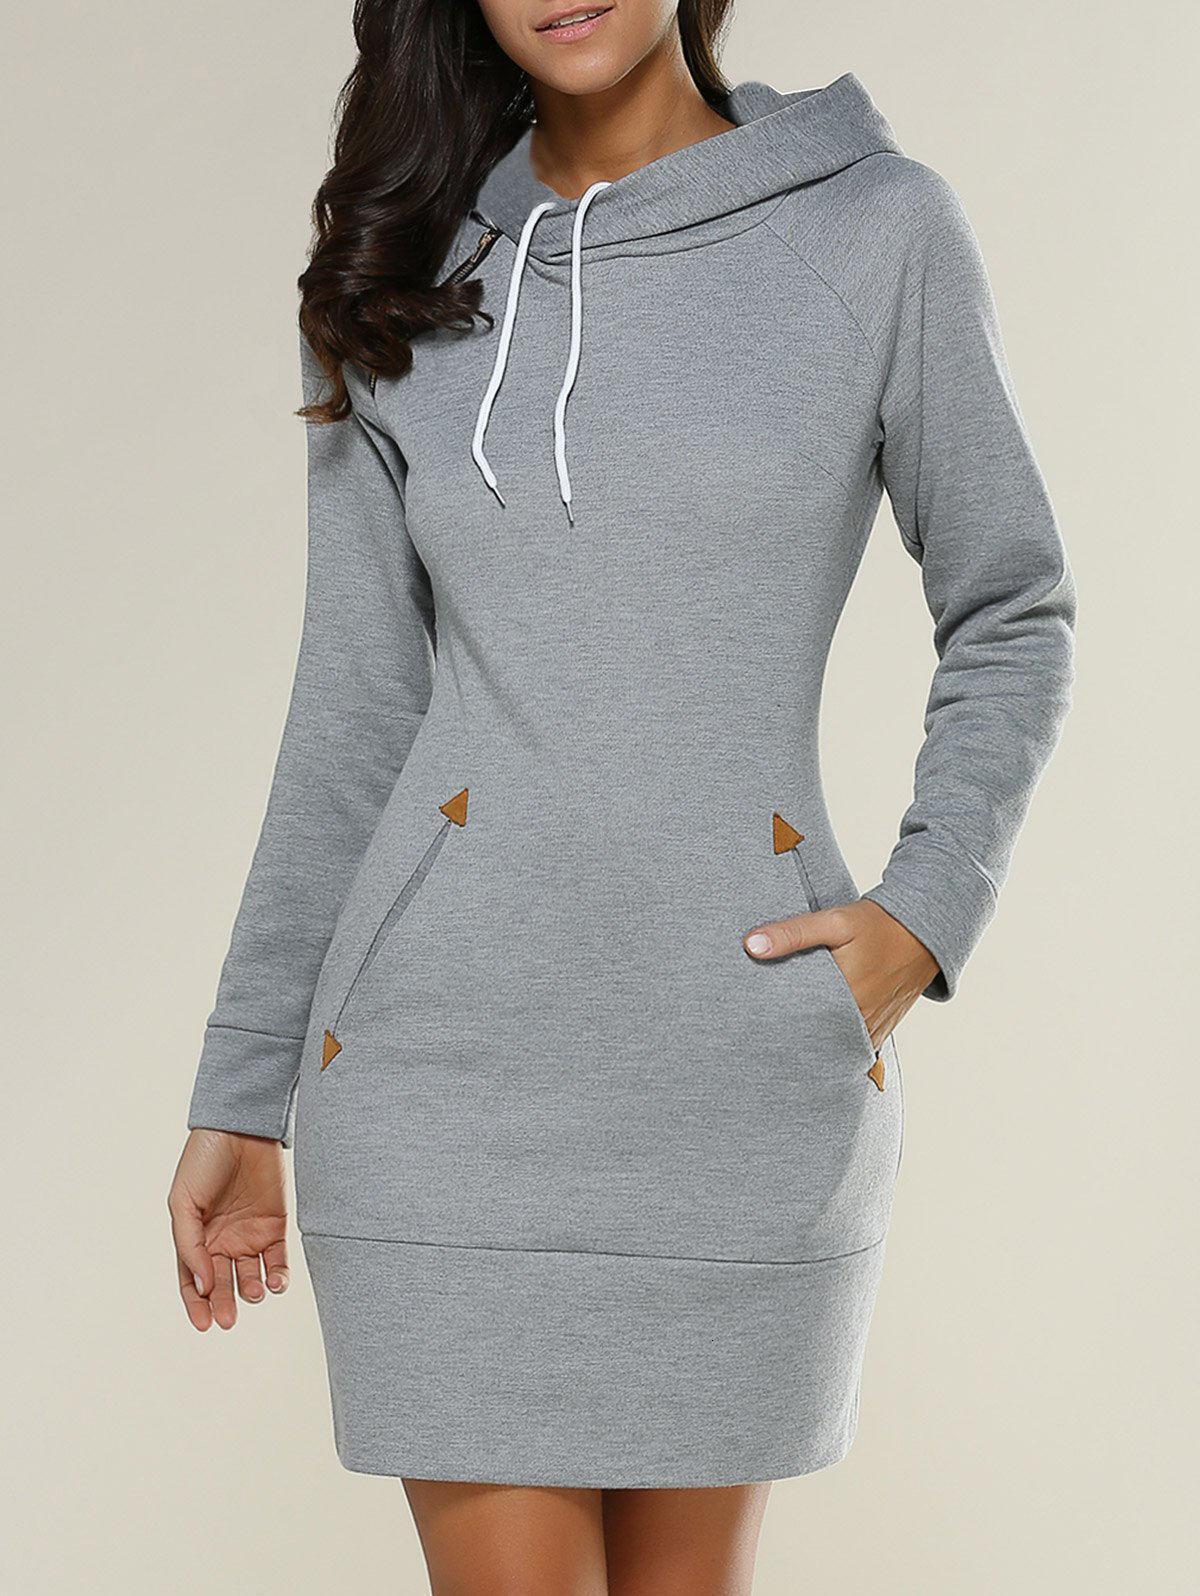 Fashion Women Hoodies Sweatshirts Long Sleeves Korean Hooded Dress Plus Size XL Autumn Slim Pullovers Female